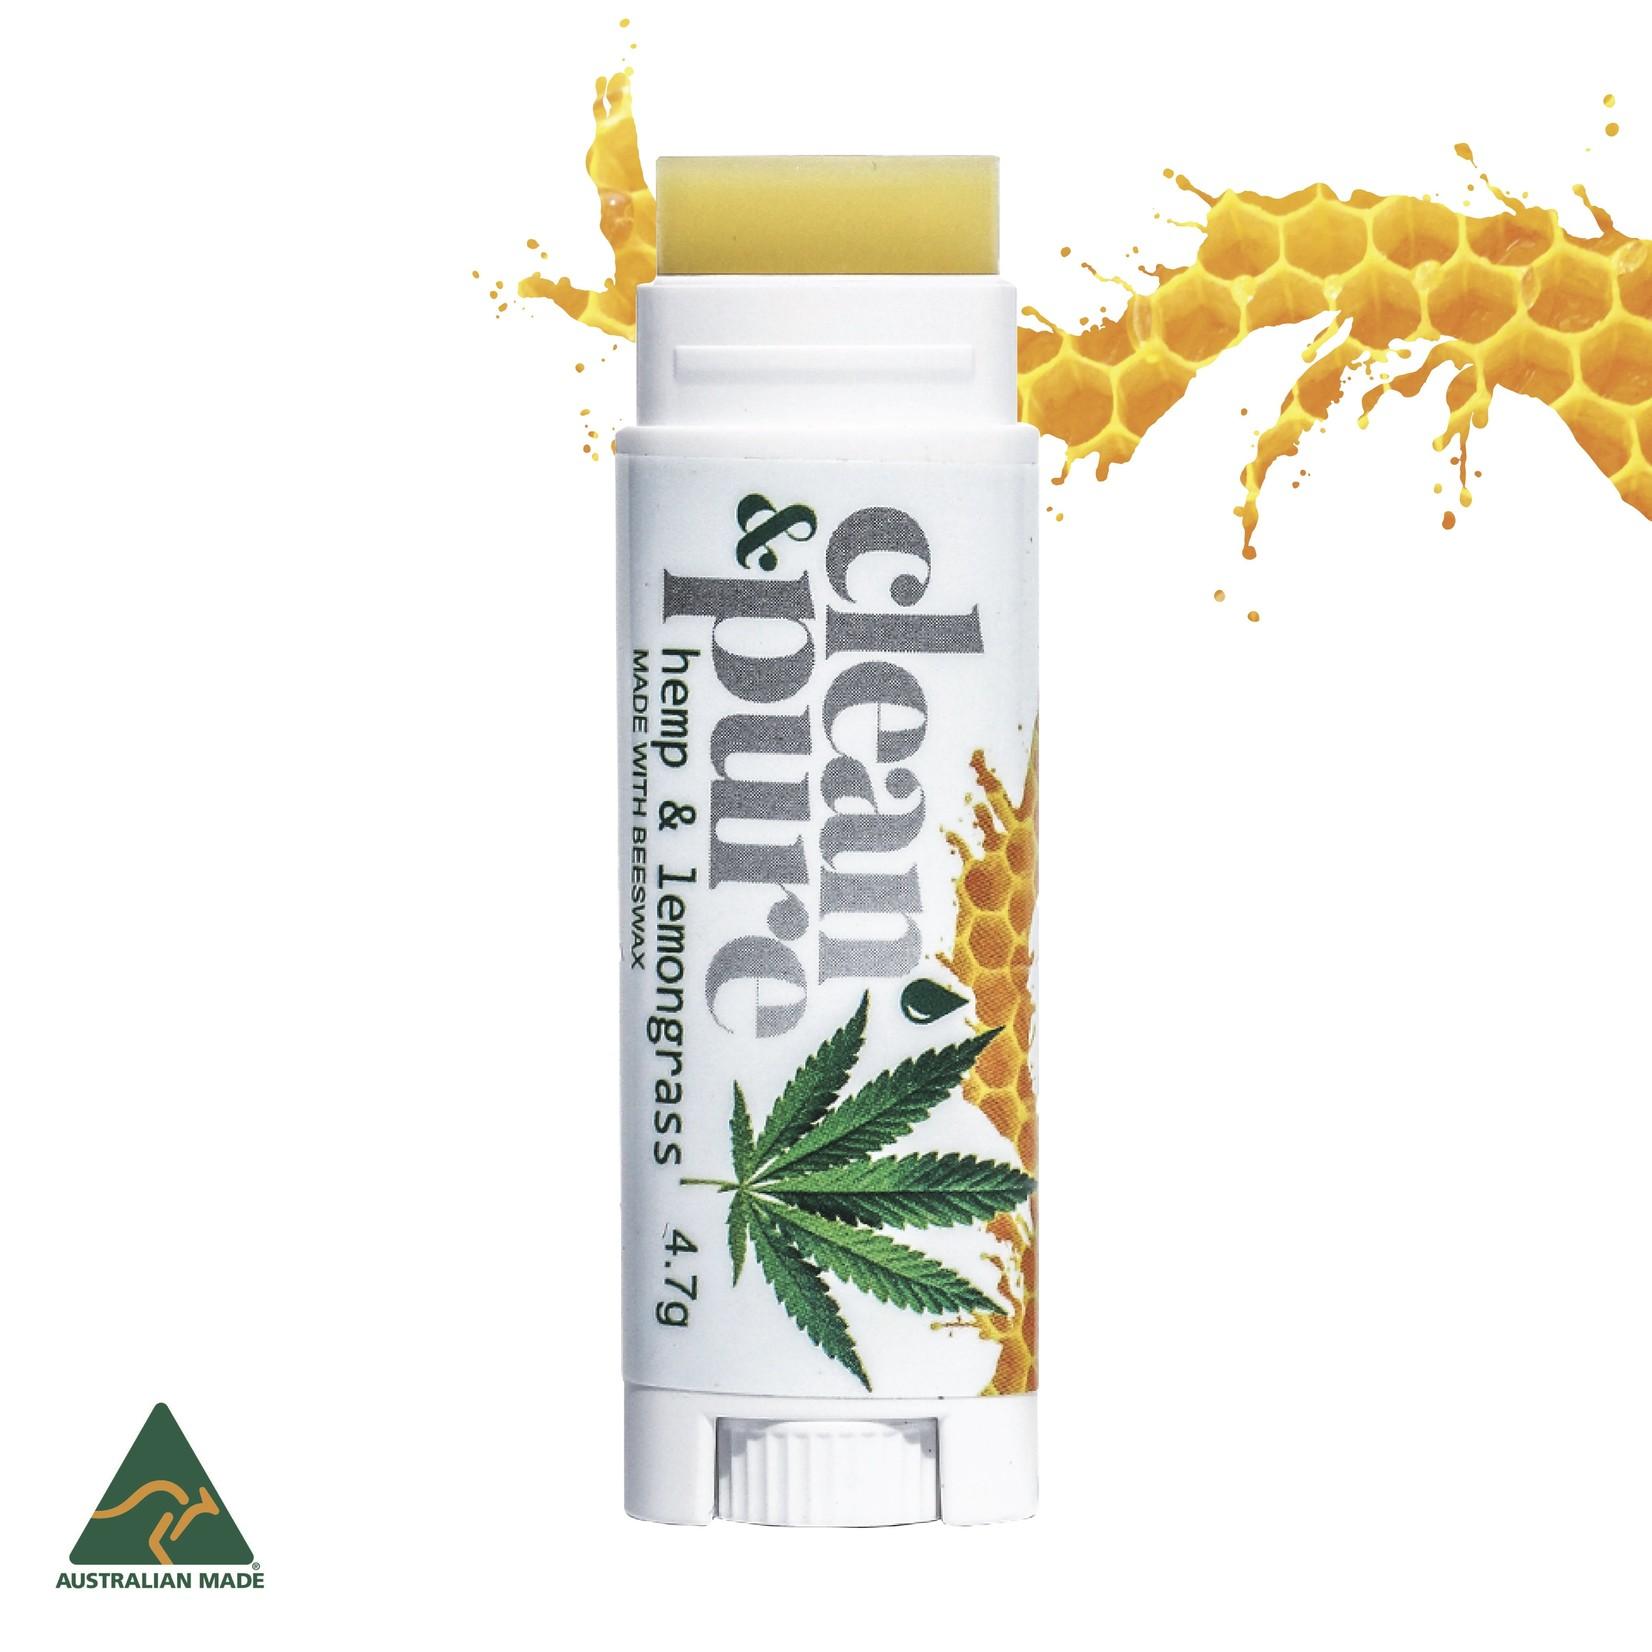 Clean & Pure Hemp & Lemongrass Lip Balm